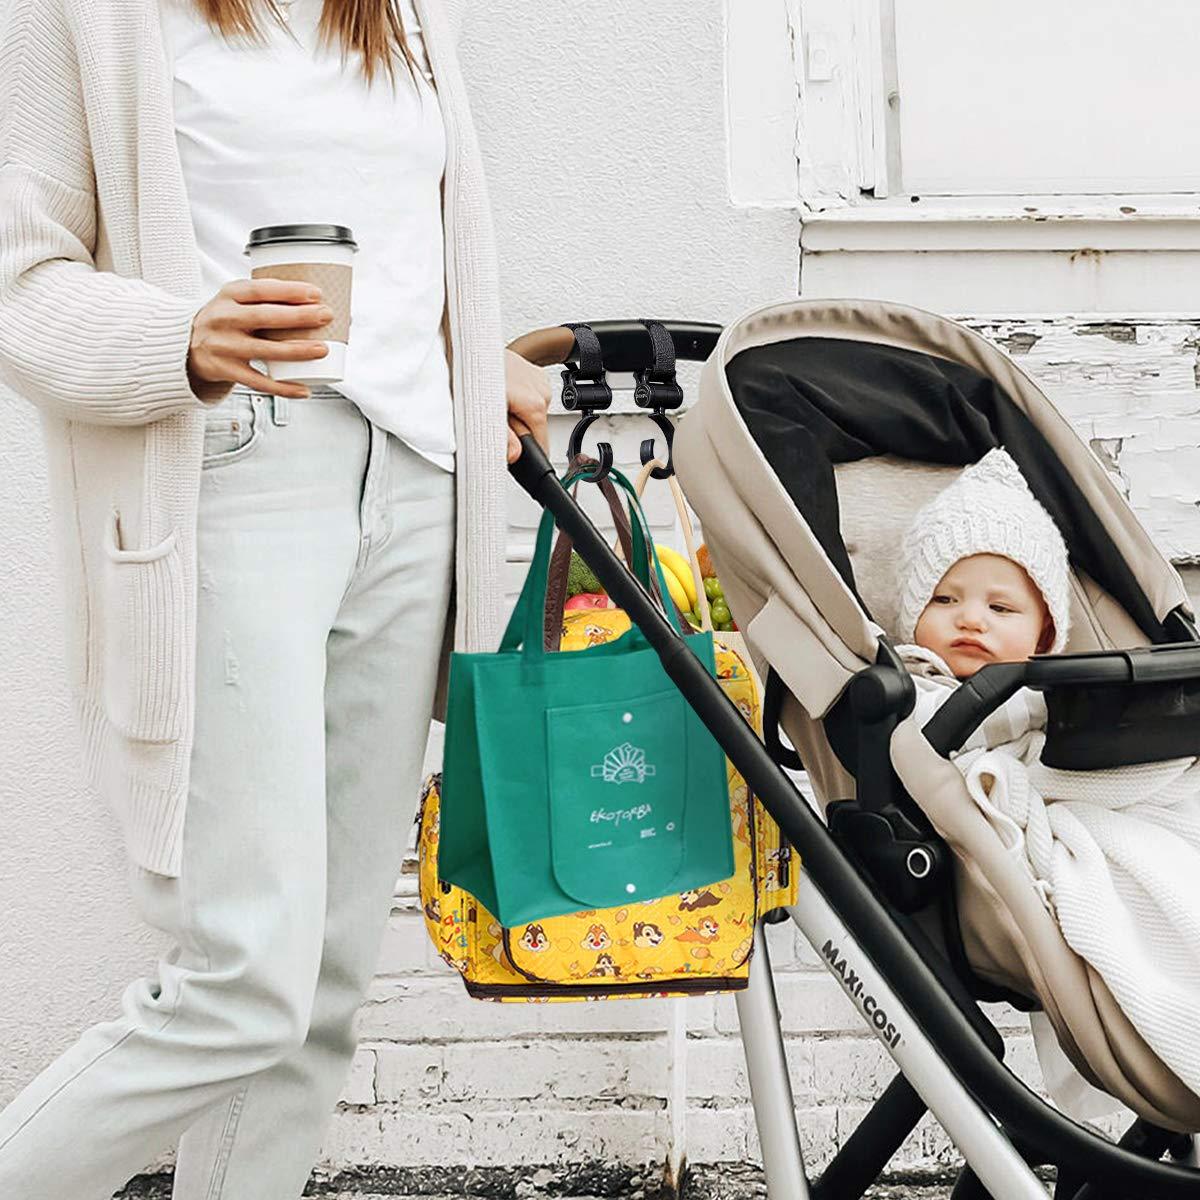 Amazon.com: Ganchos para cochecito de bebé, prácticos ...